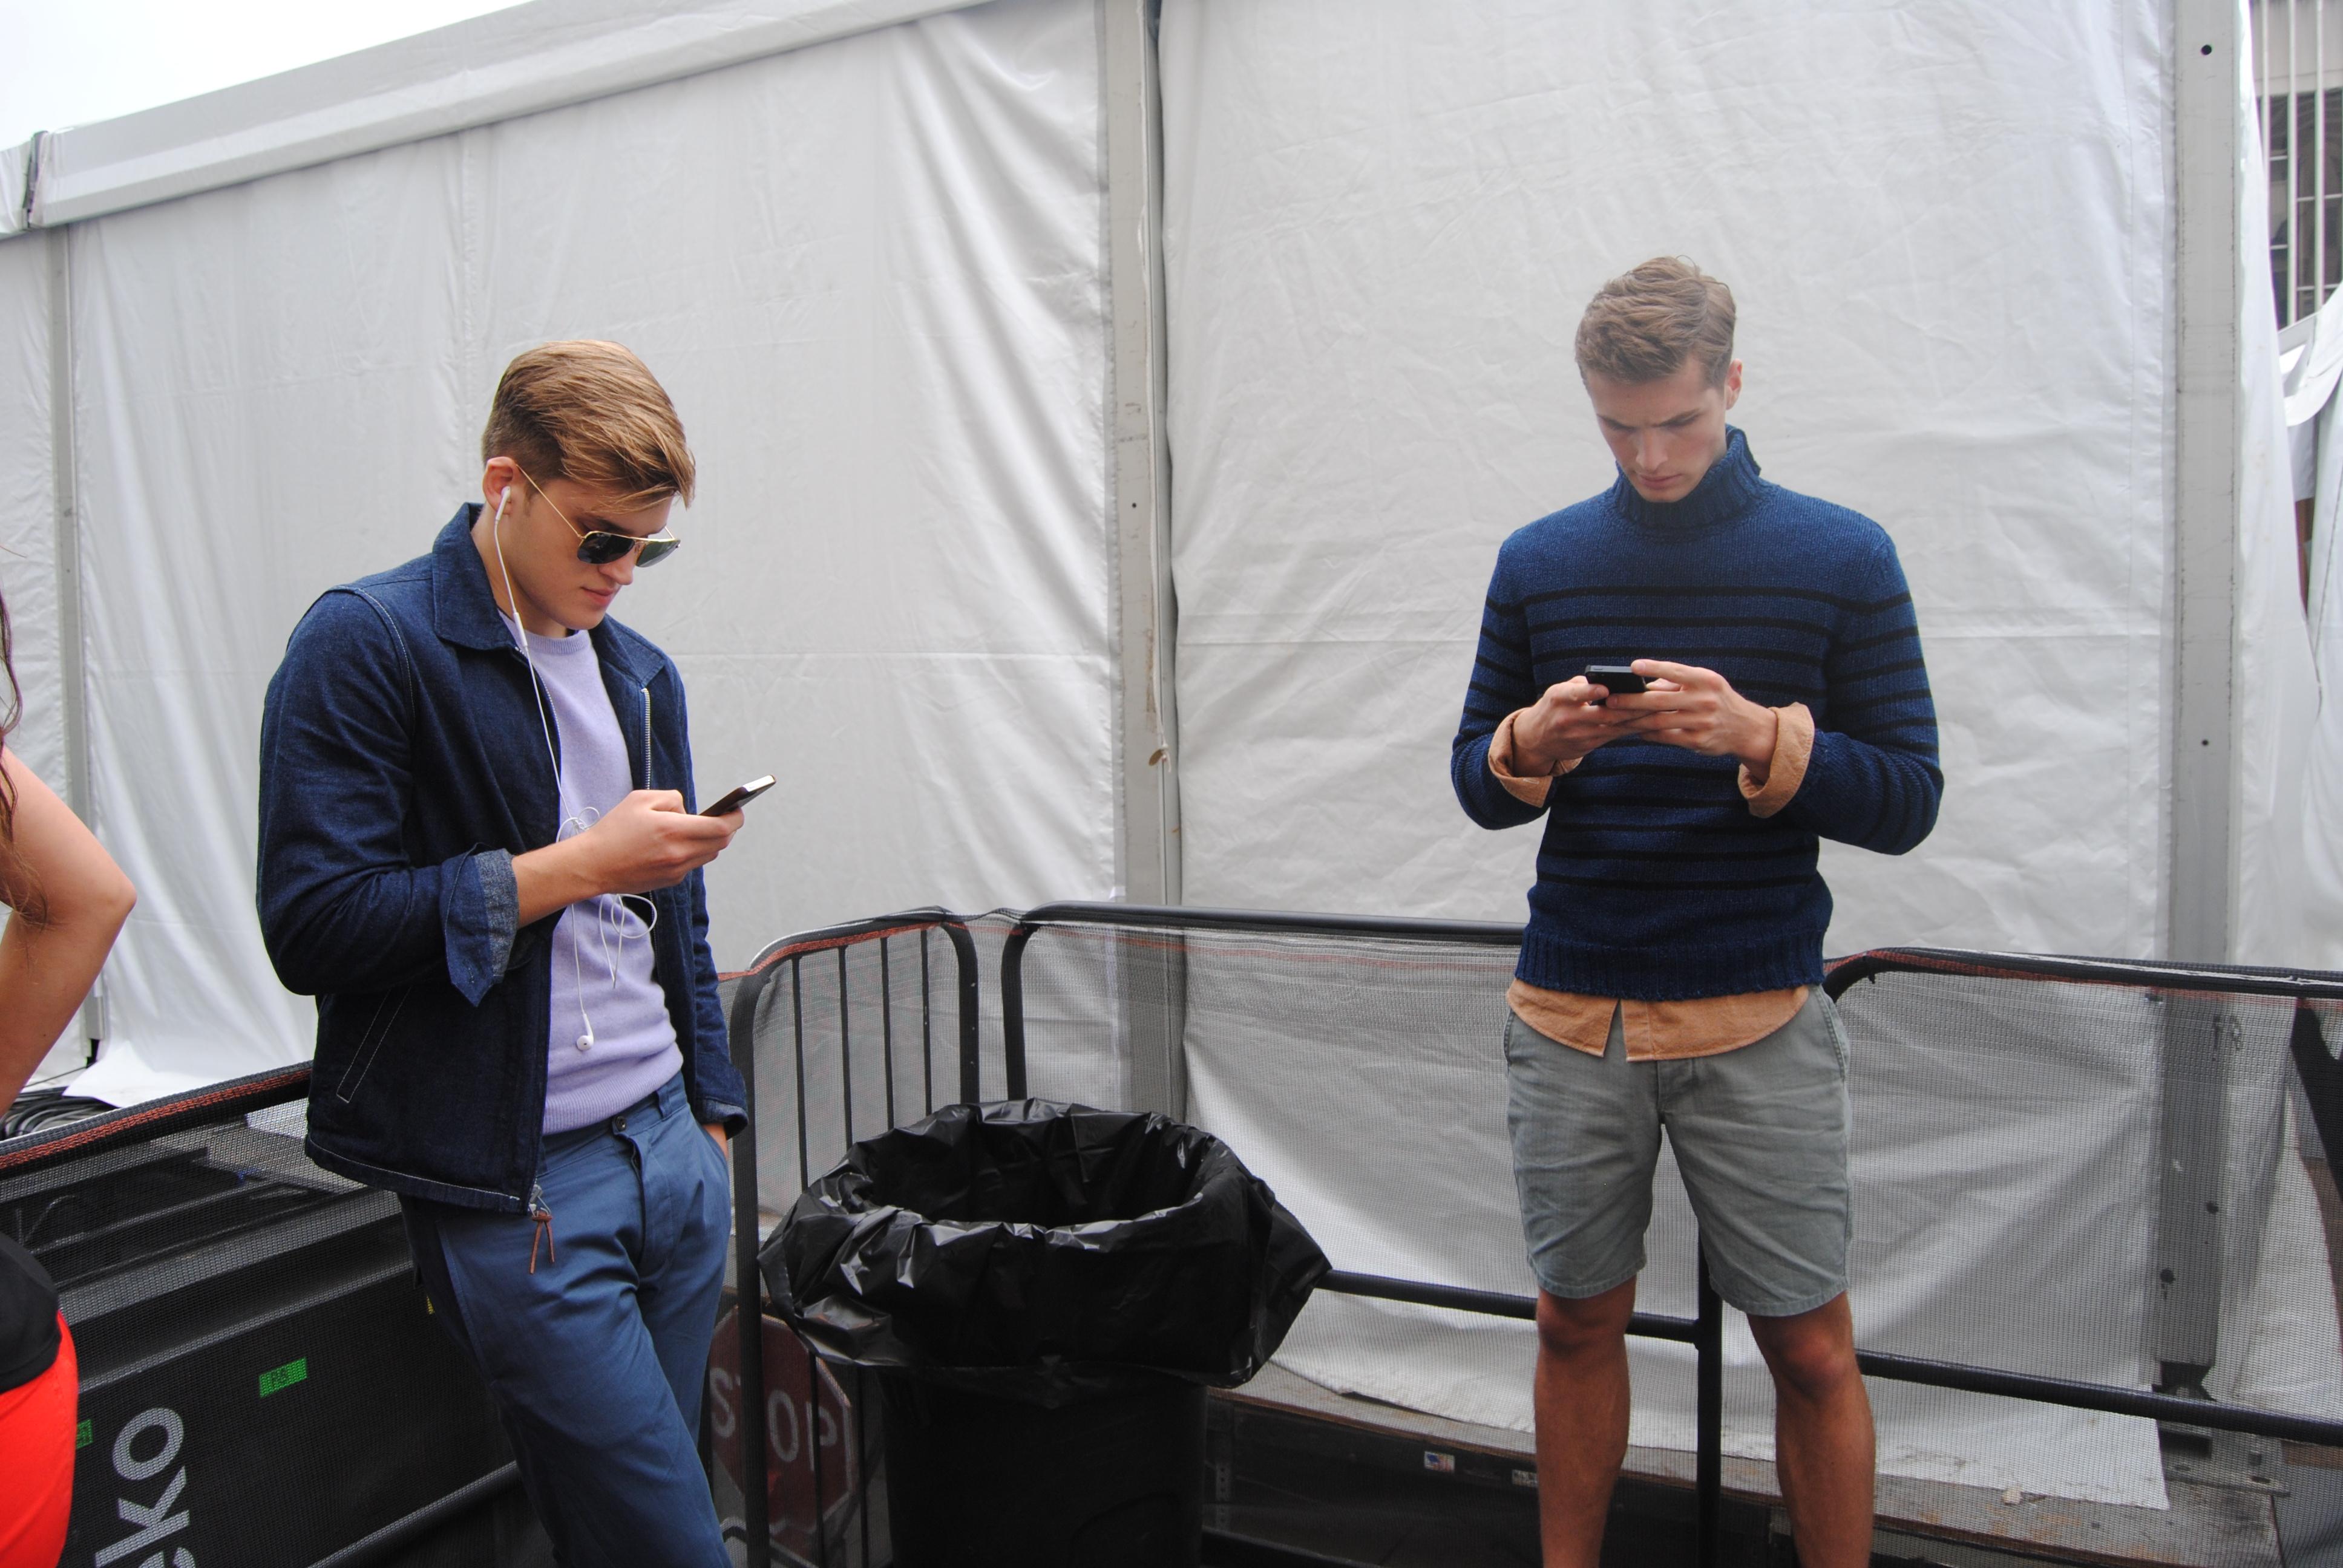 Model boys on their phones (Ko Im/DC on Heels)